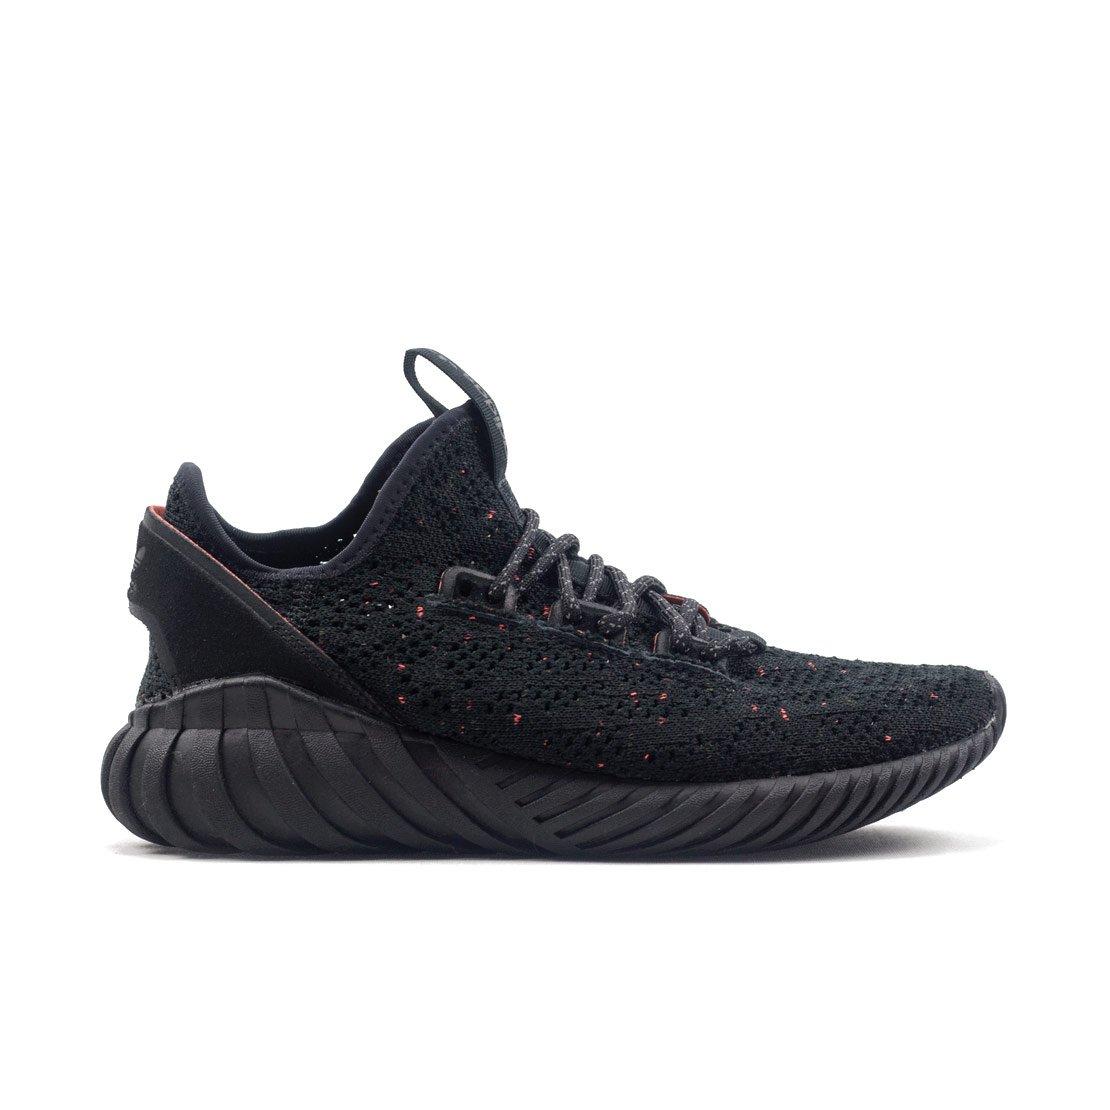 f742e2517d36c0 Adidas Tubular Doom Sock Primeknit Big Kid s Shoes Core Black bz0330 (7 M  US)  Amazon.co.uk  Shoes   Bags